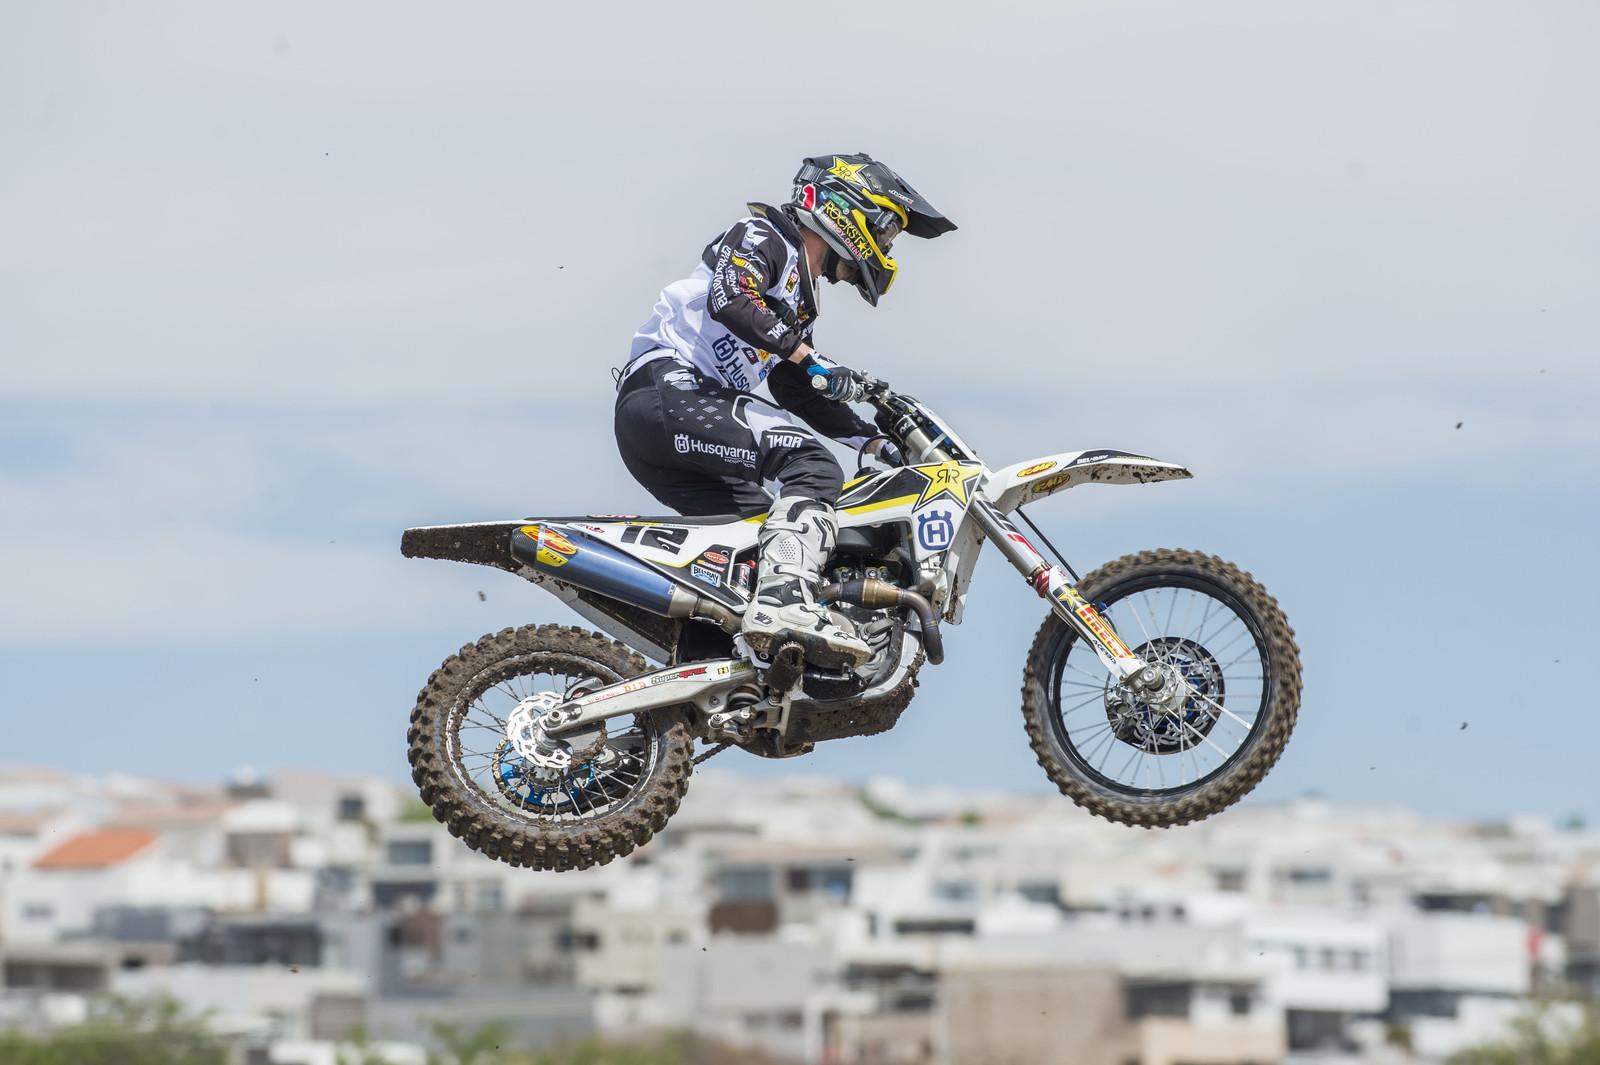 Max Nagl - Photo Blast: 2017 MXGP of Mexico - Motocross Pictures - Vital MX